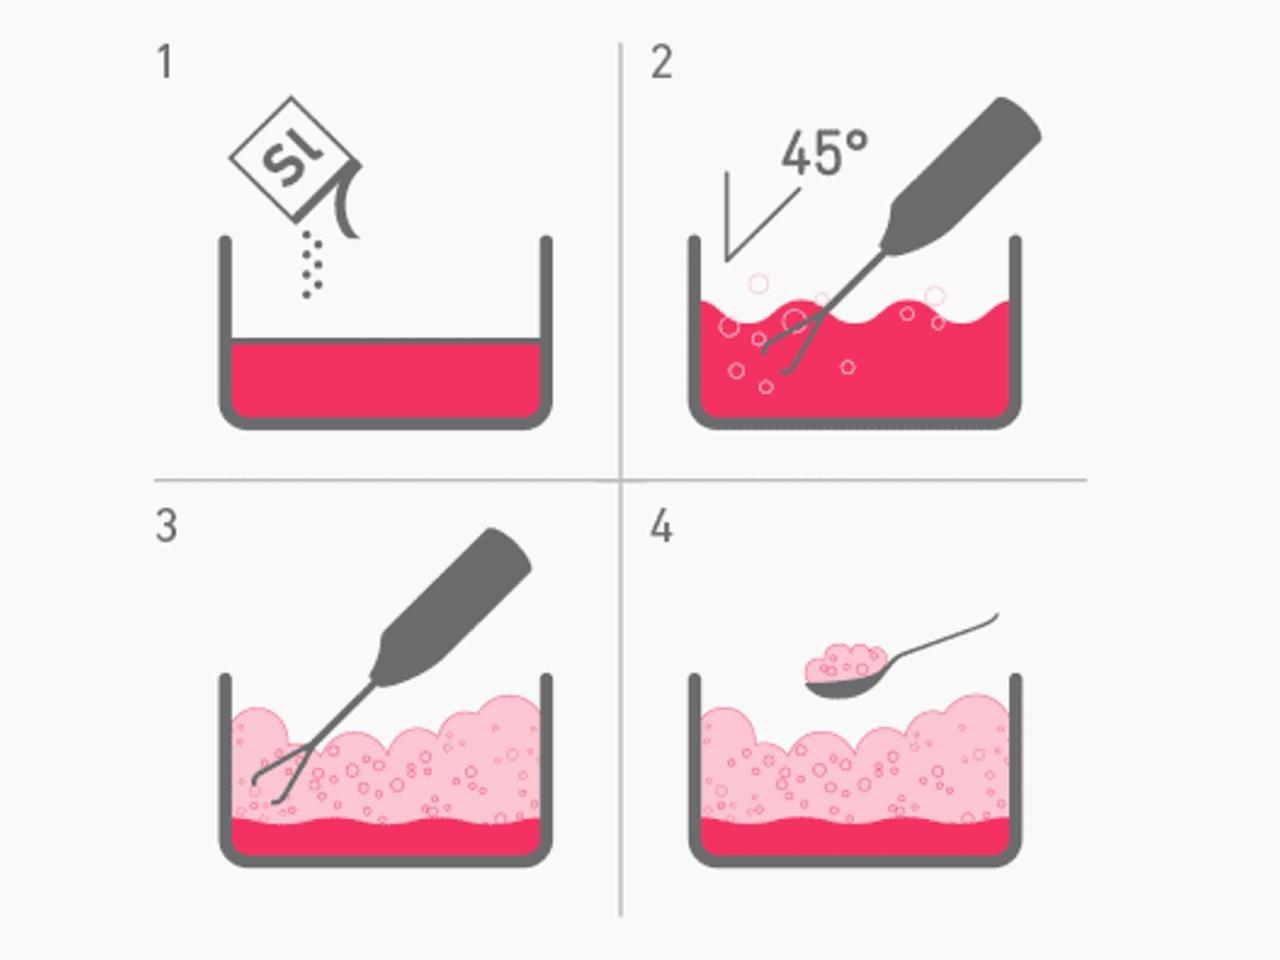 Molecule-R Quirl Elektro-Spume oder Gebiete